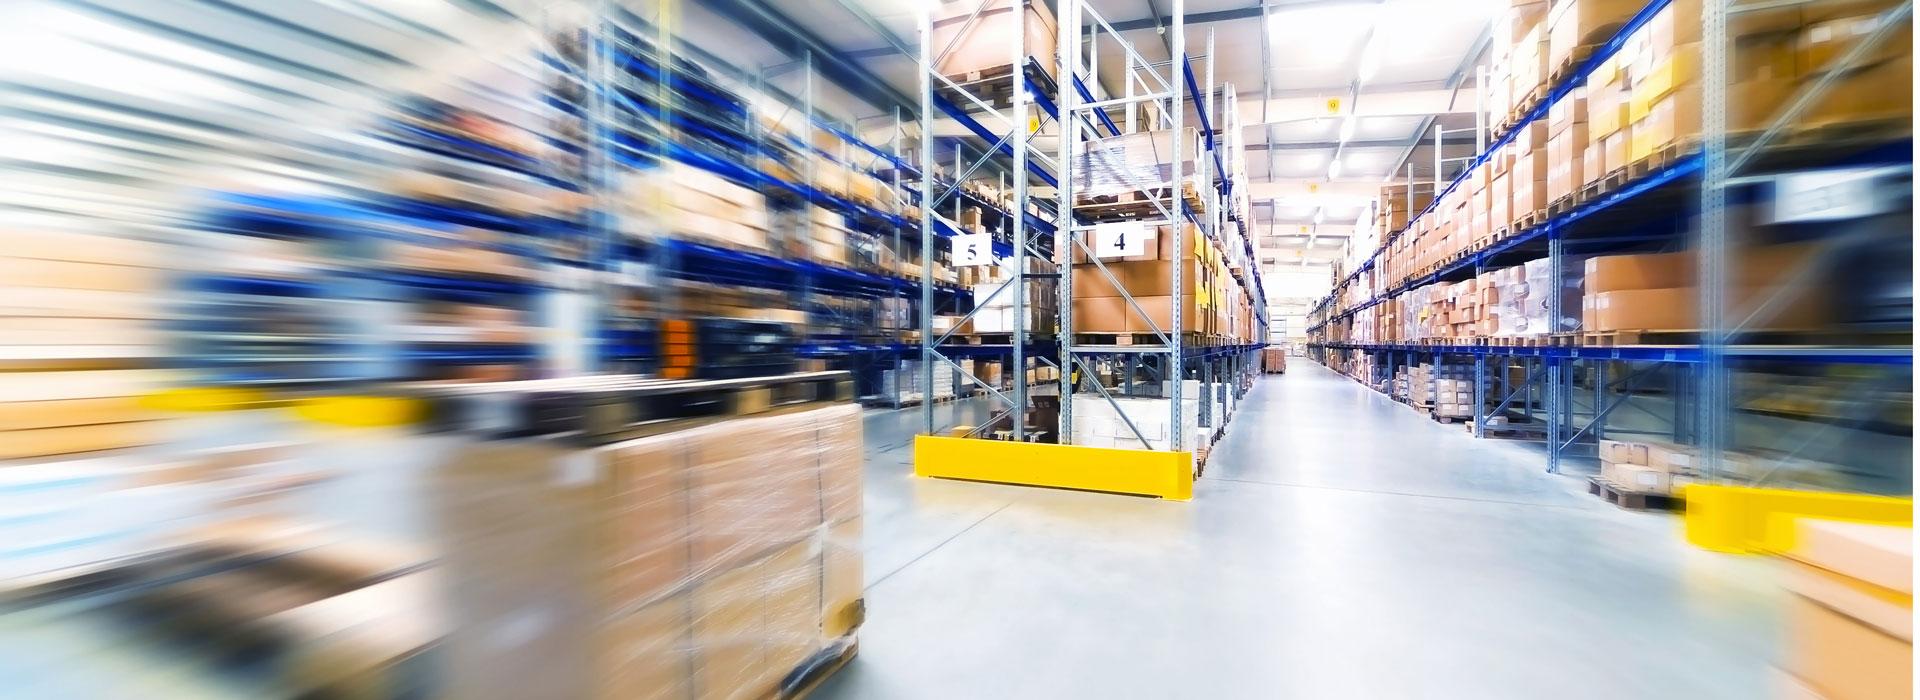 Slider3- Warehouse Logisitcs